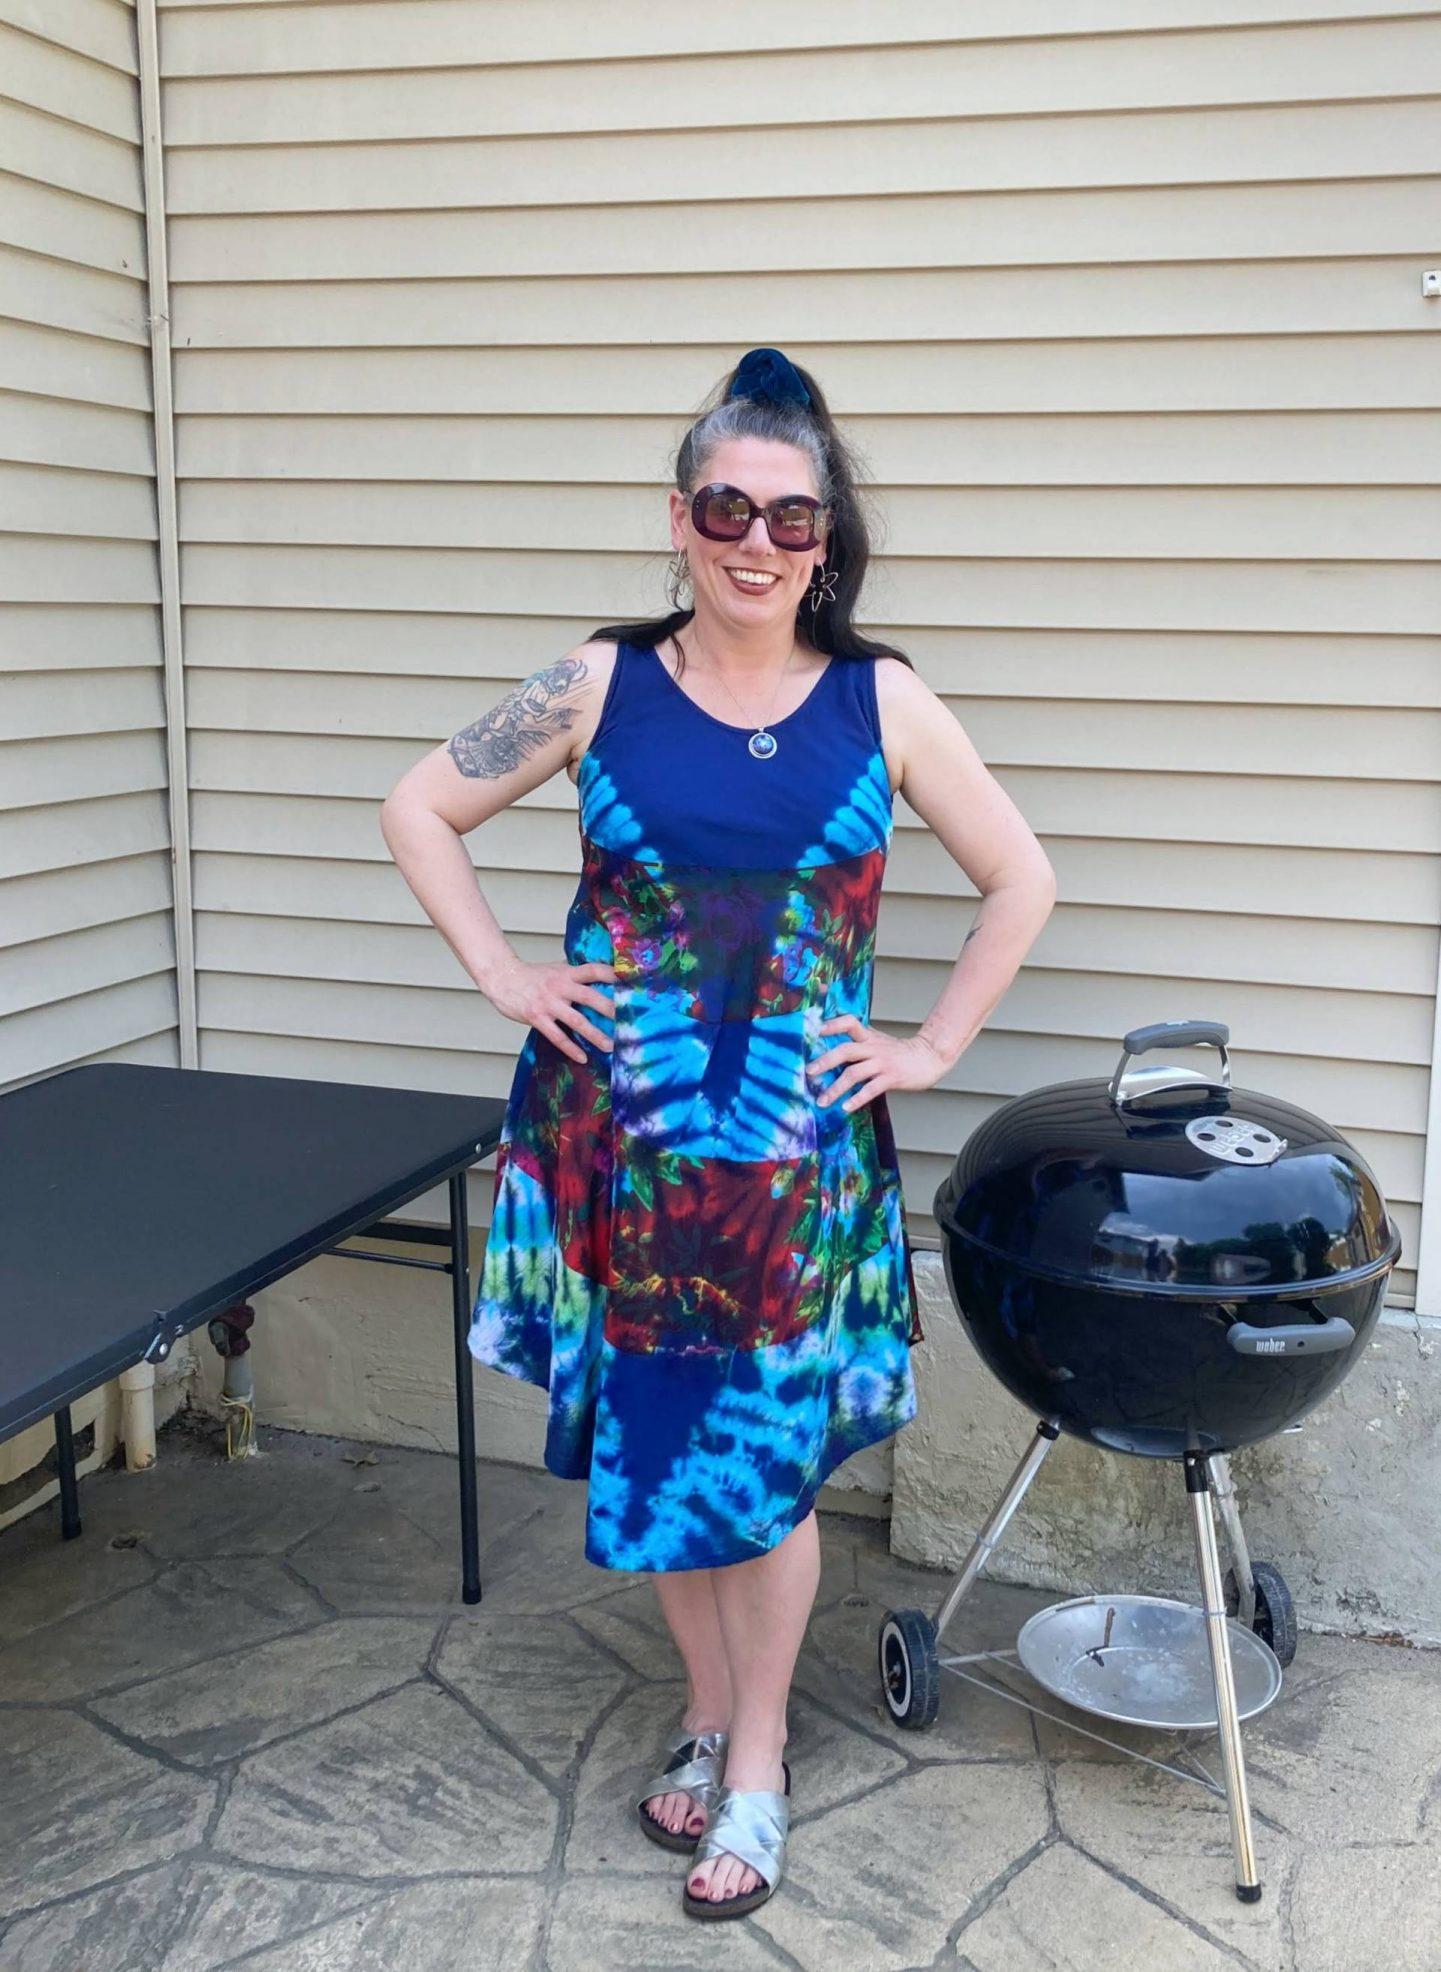 Sizzlin' Backyard BBQ Style, Shelbee on the Edge